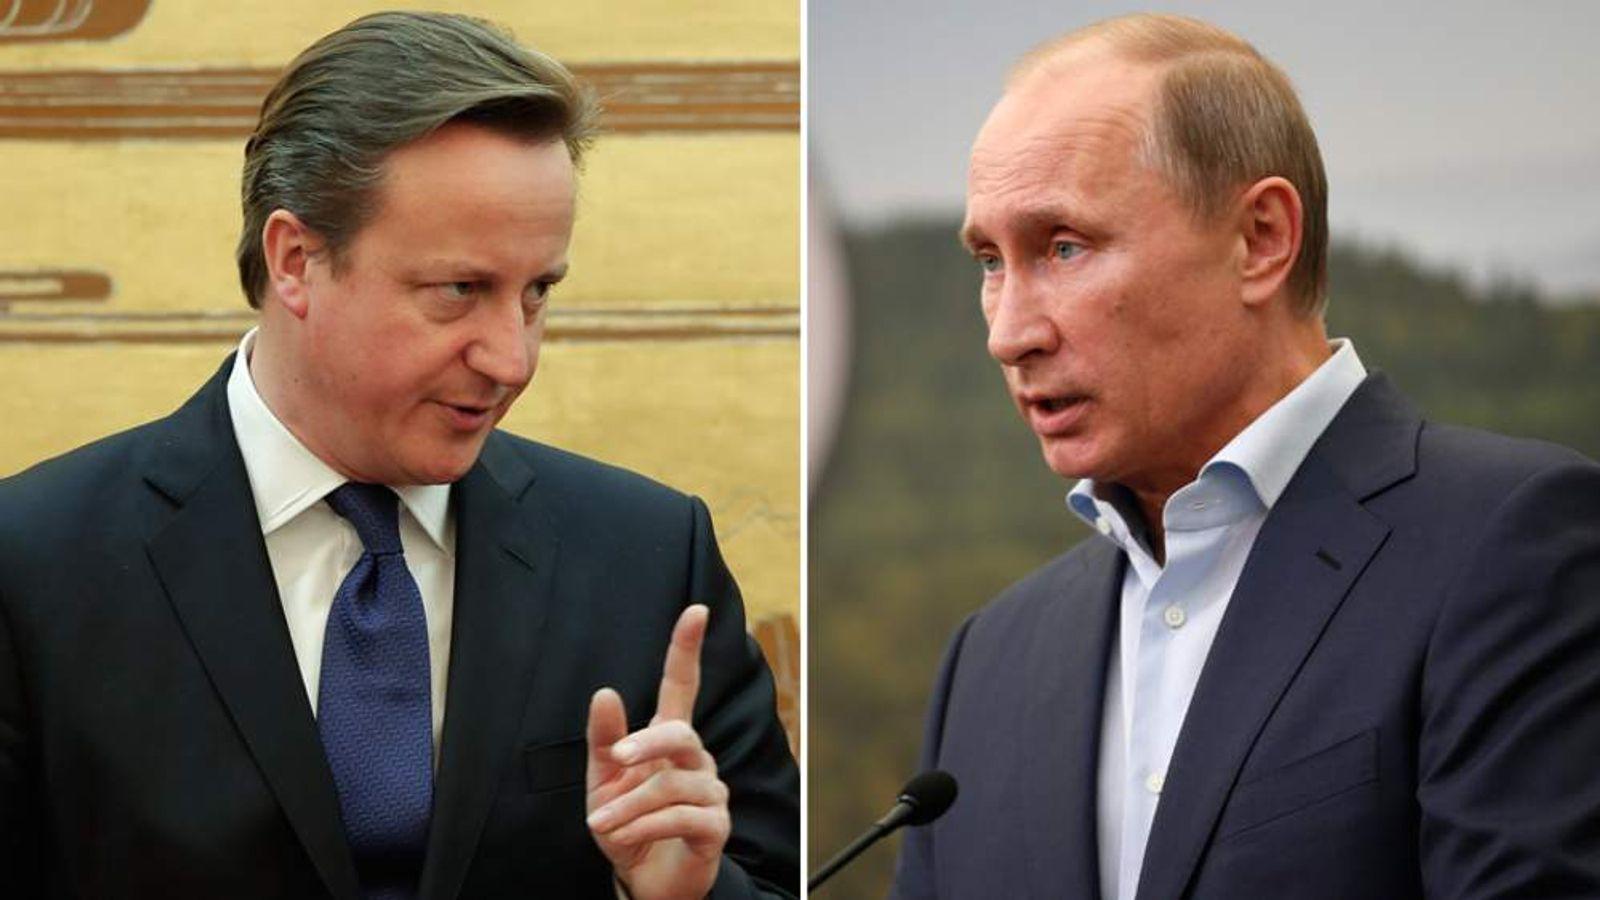 British Prime Minister David Cameron Visits China